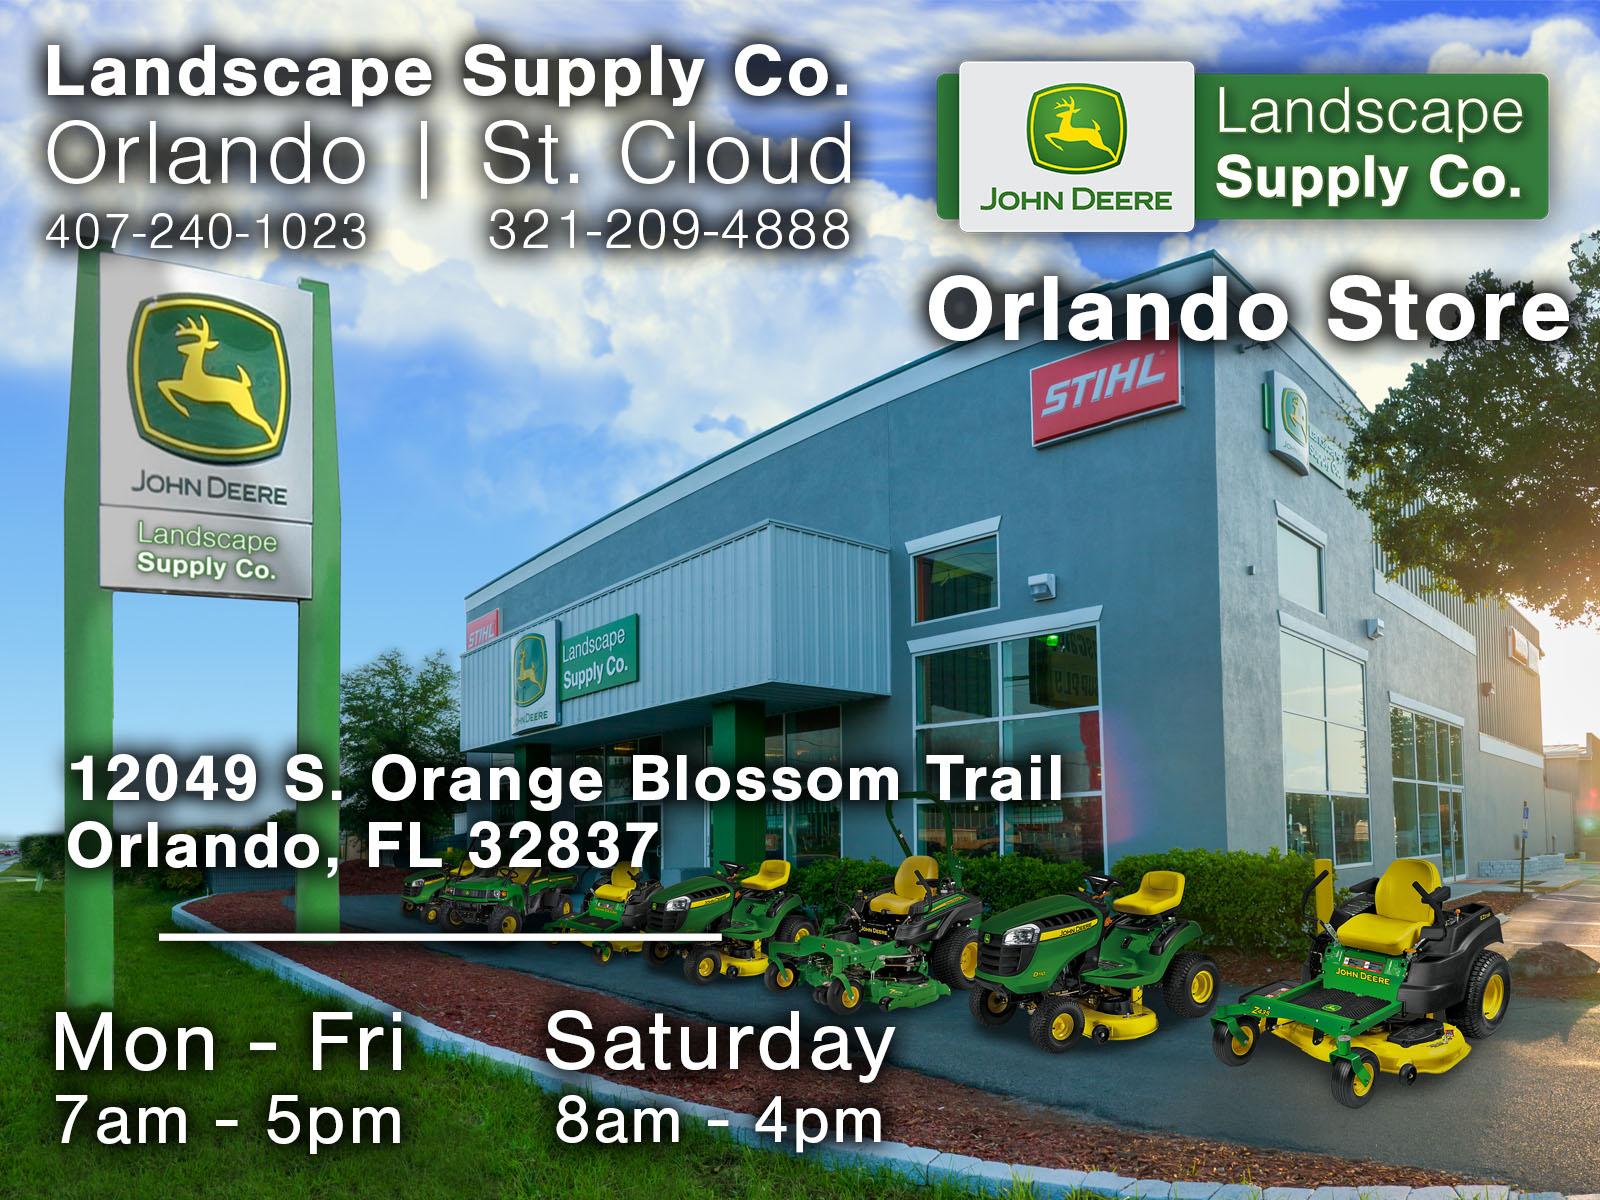 Sod Supplier In Orlando Fl John Deere At Landscape Supply Co